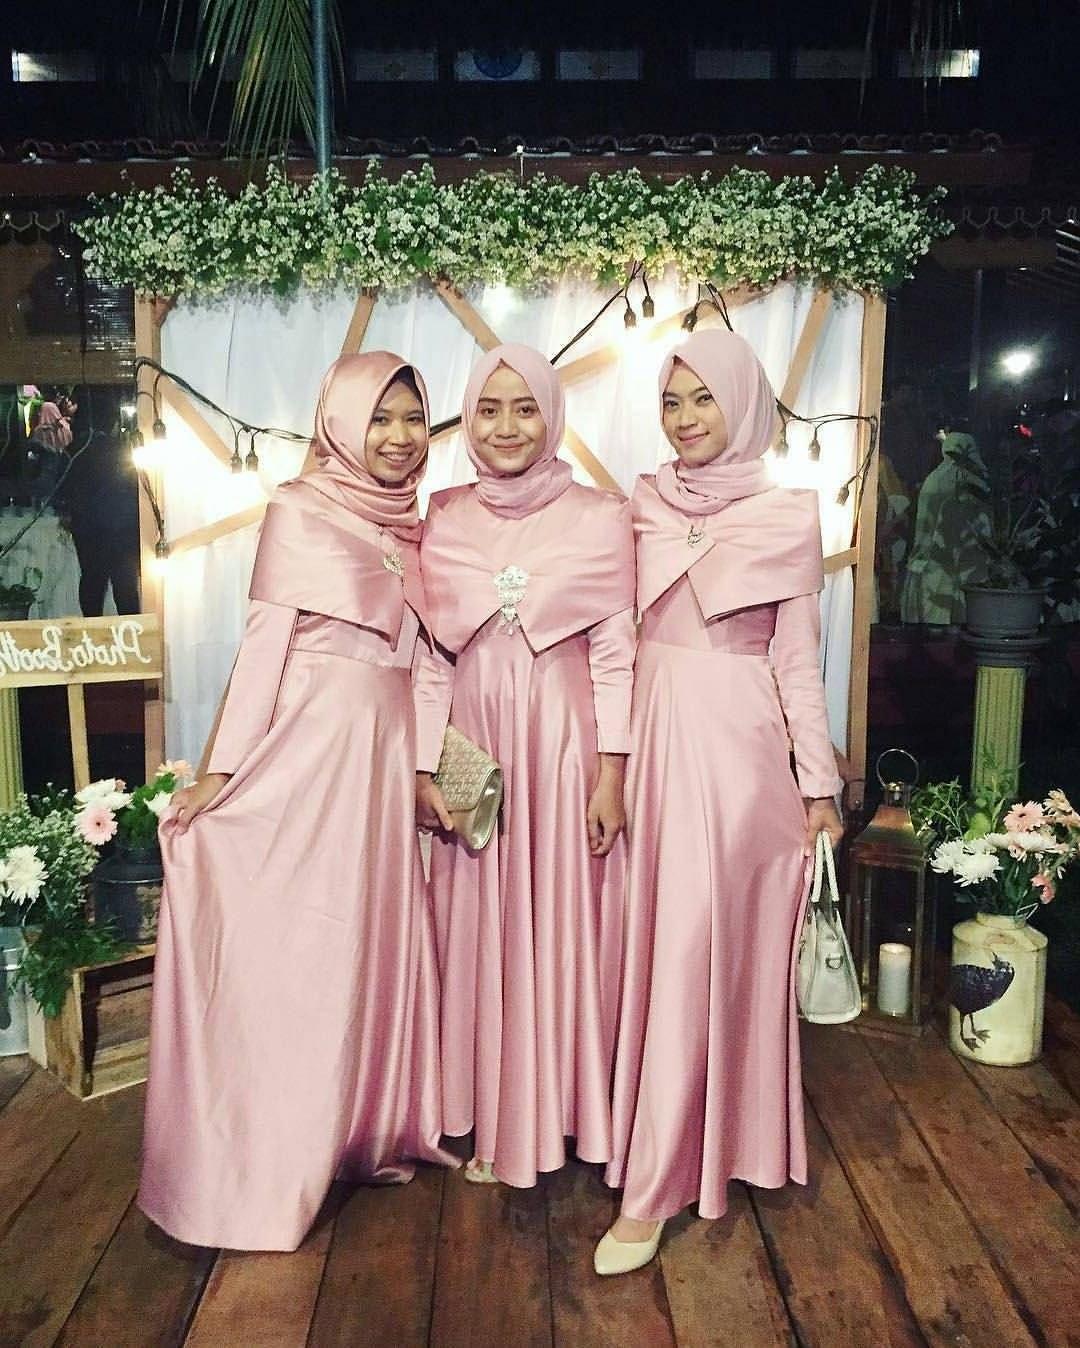 Model Model Baju Bridesmaid Hijab 2019 E6d5 Pin by Sri Widati Resiningrum soecipto soeryopoetro On Baju2